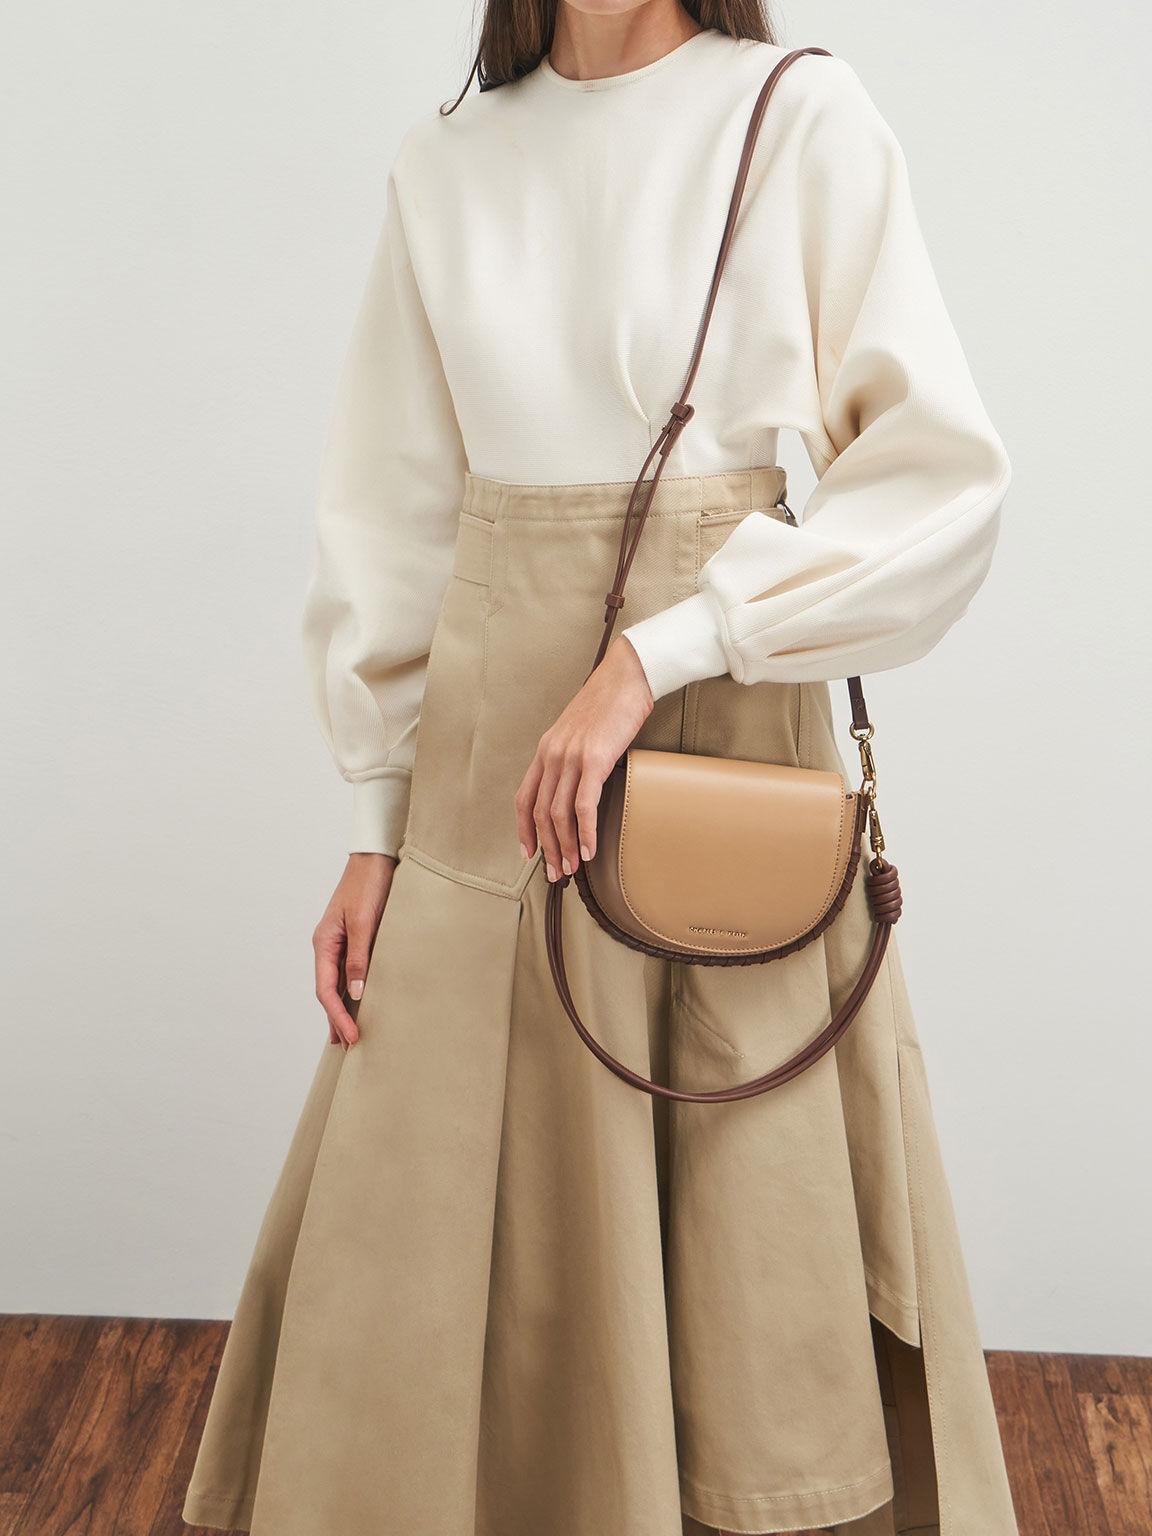 Stitch Trim Saddle Bag, Camel, hi-res